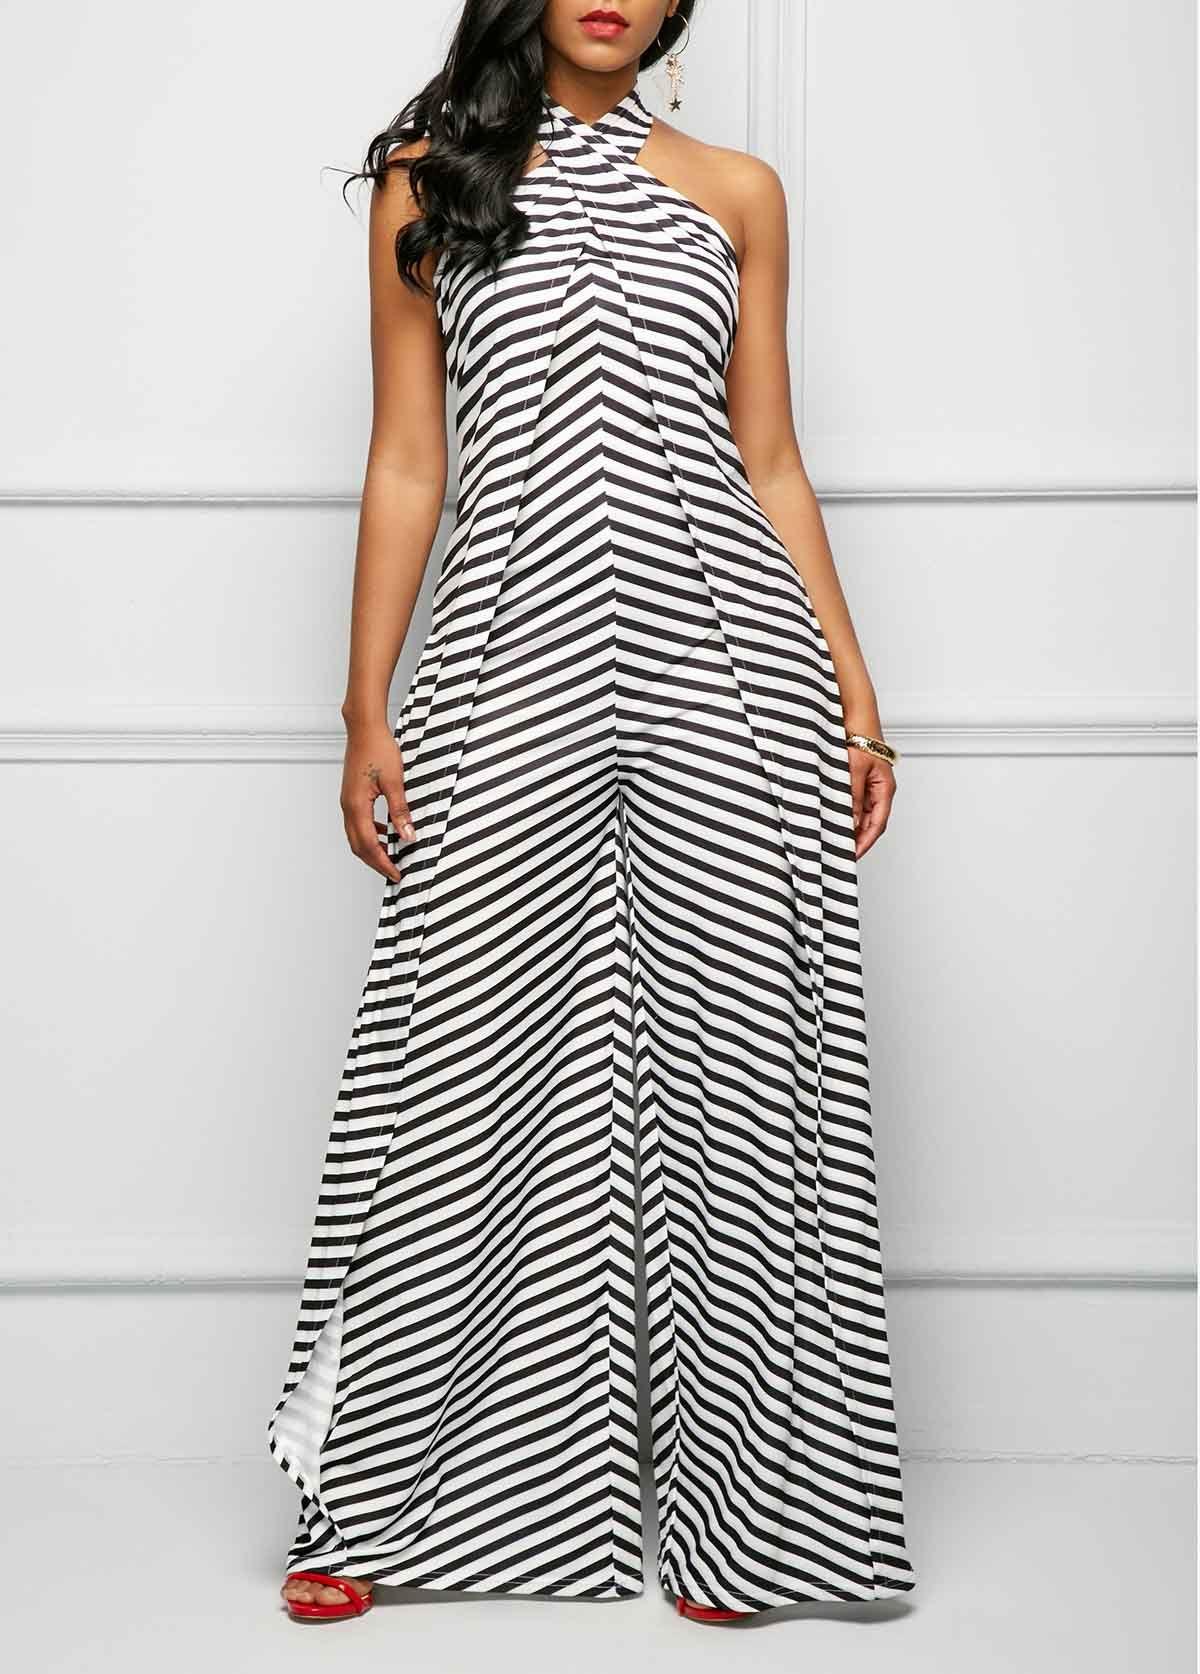 Halter Neck Stripe Print Cross Front Jumpsuit Rosewe Com Usd 36 23 Macacao Feminino Longo Vestidos Roupas Chique